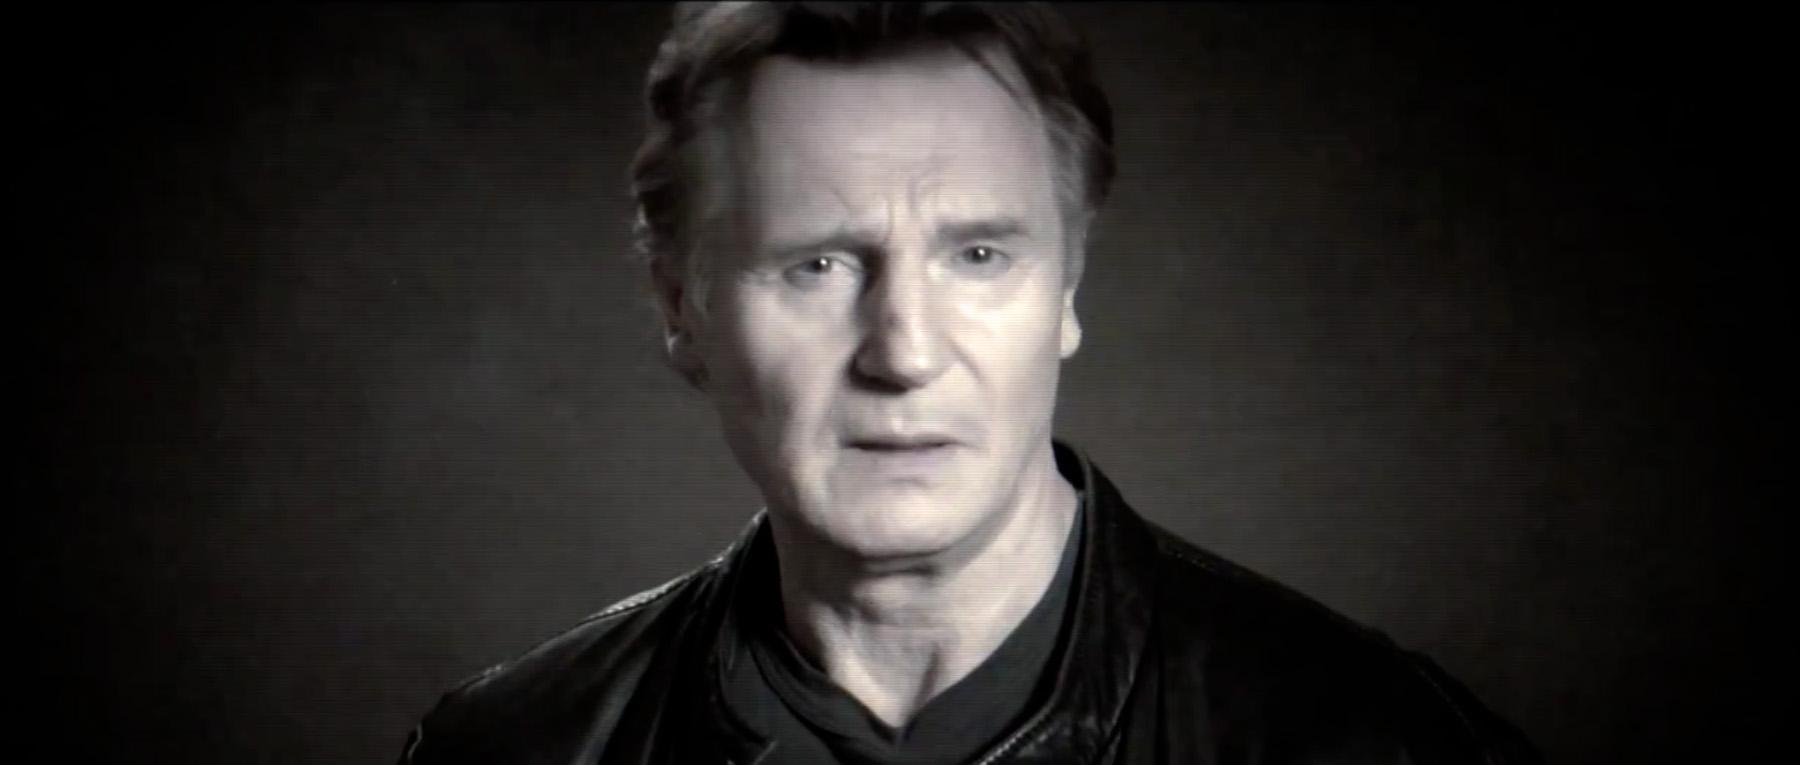 Liam Neeson's 'Taken' character will endorse your skills on LinkedIn http://t.co/dG3BnKsrBD http://t.co/FCsppHRWyM